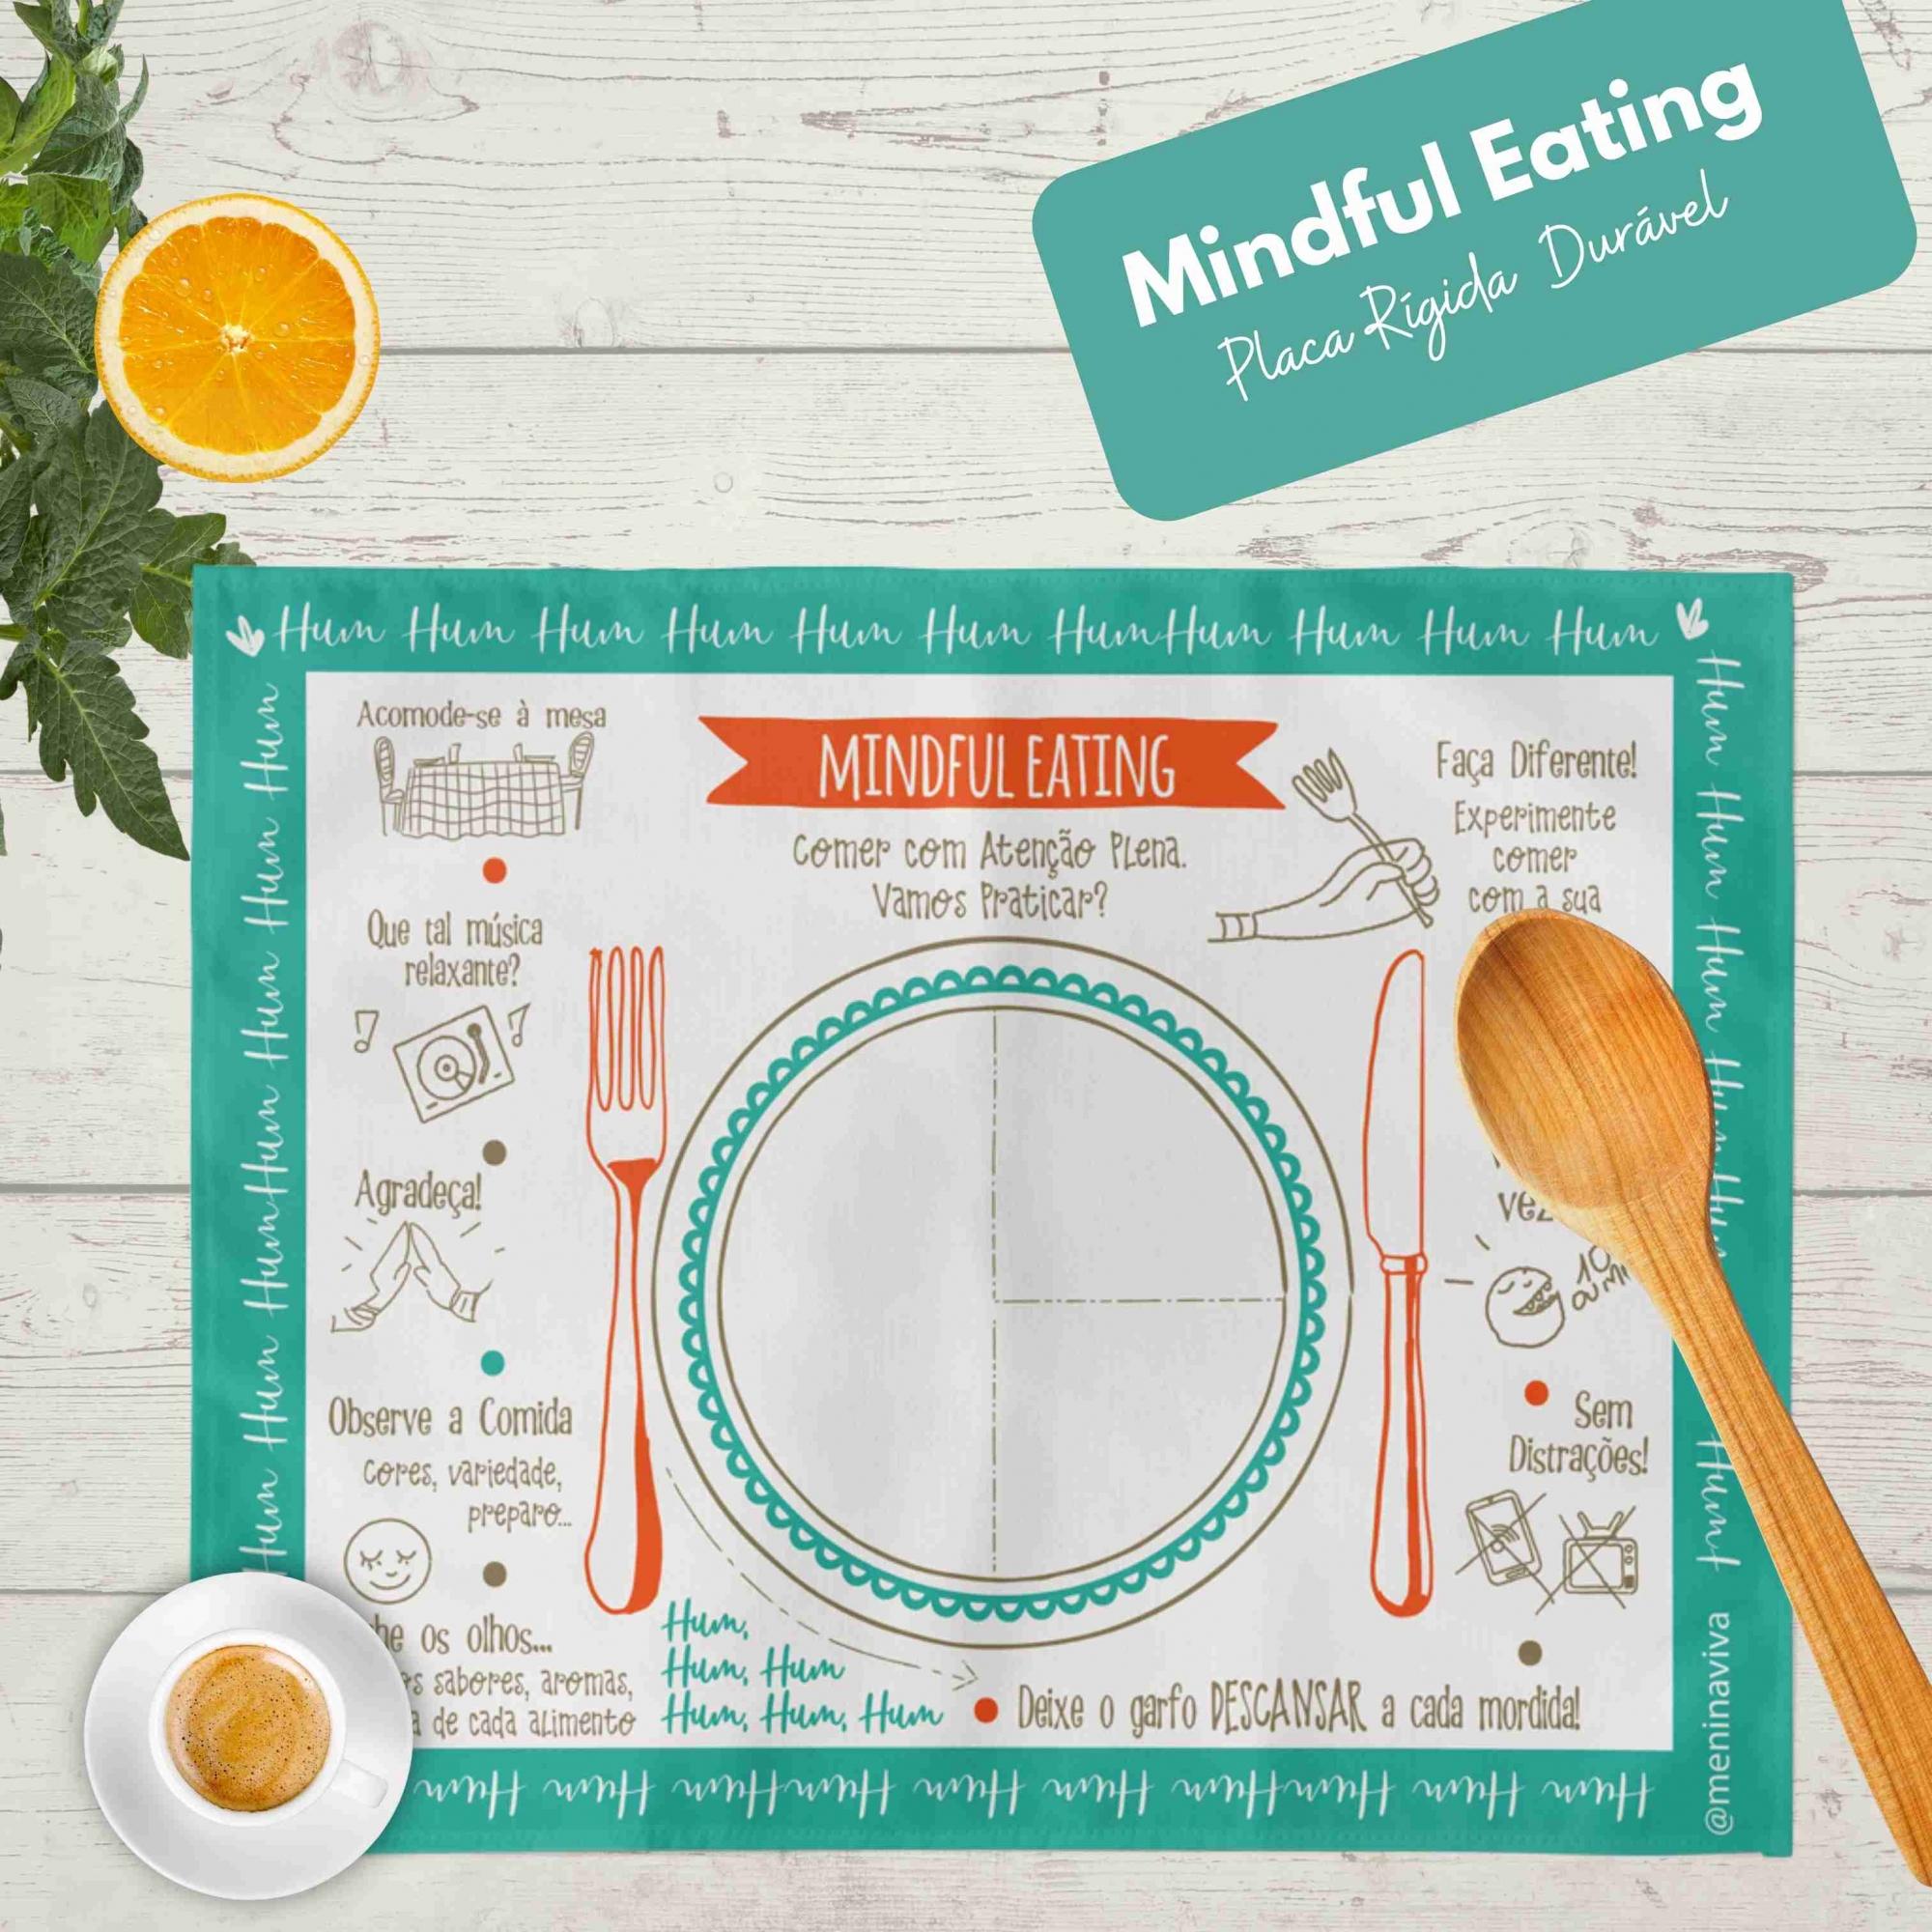 Mindful Eating  BLUE - Placa Rígida em P.S